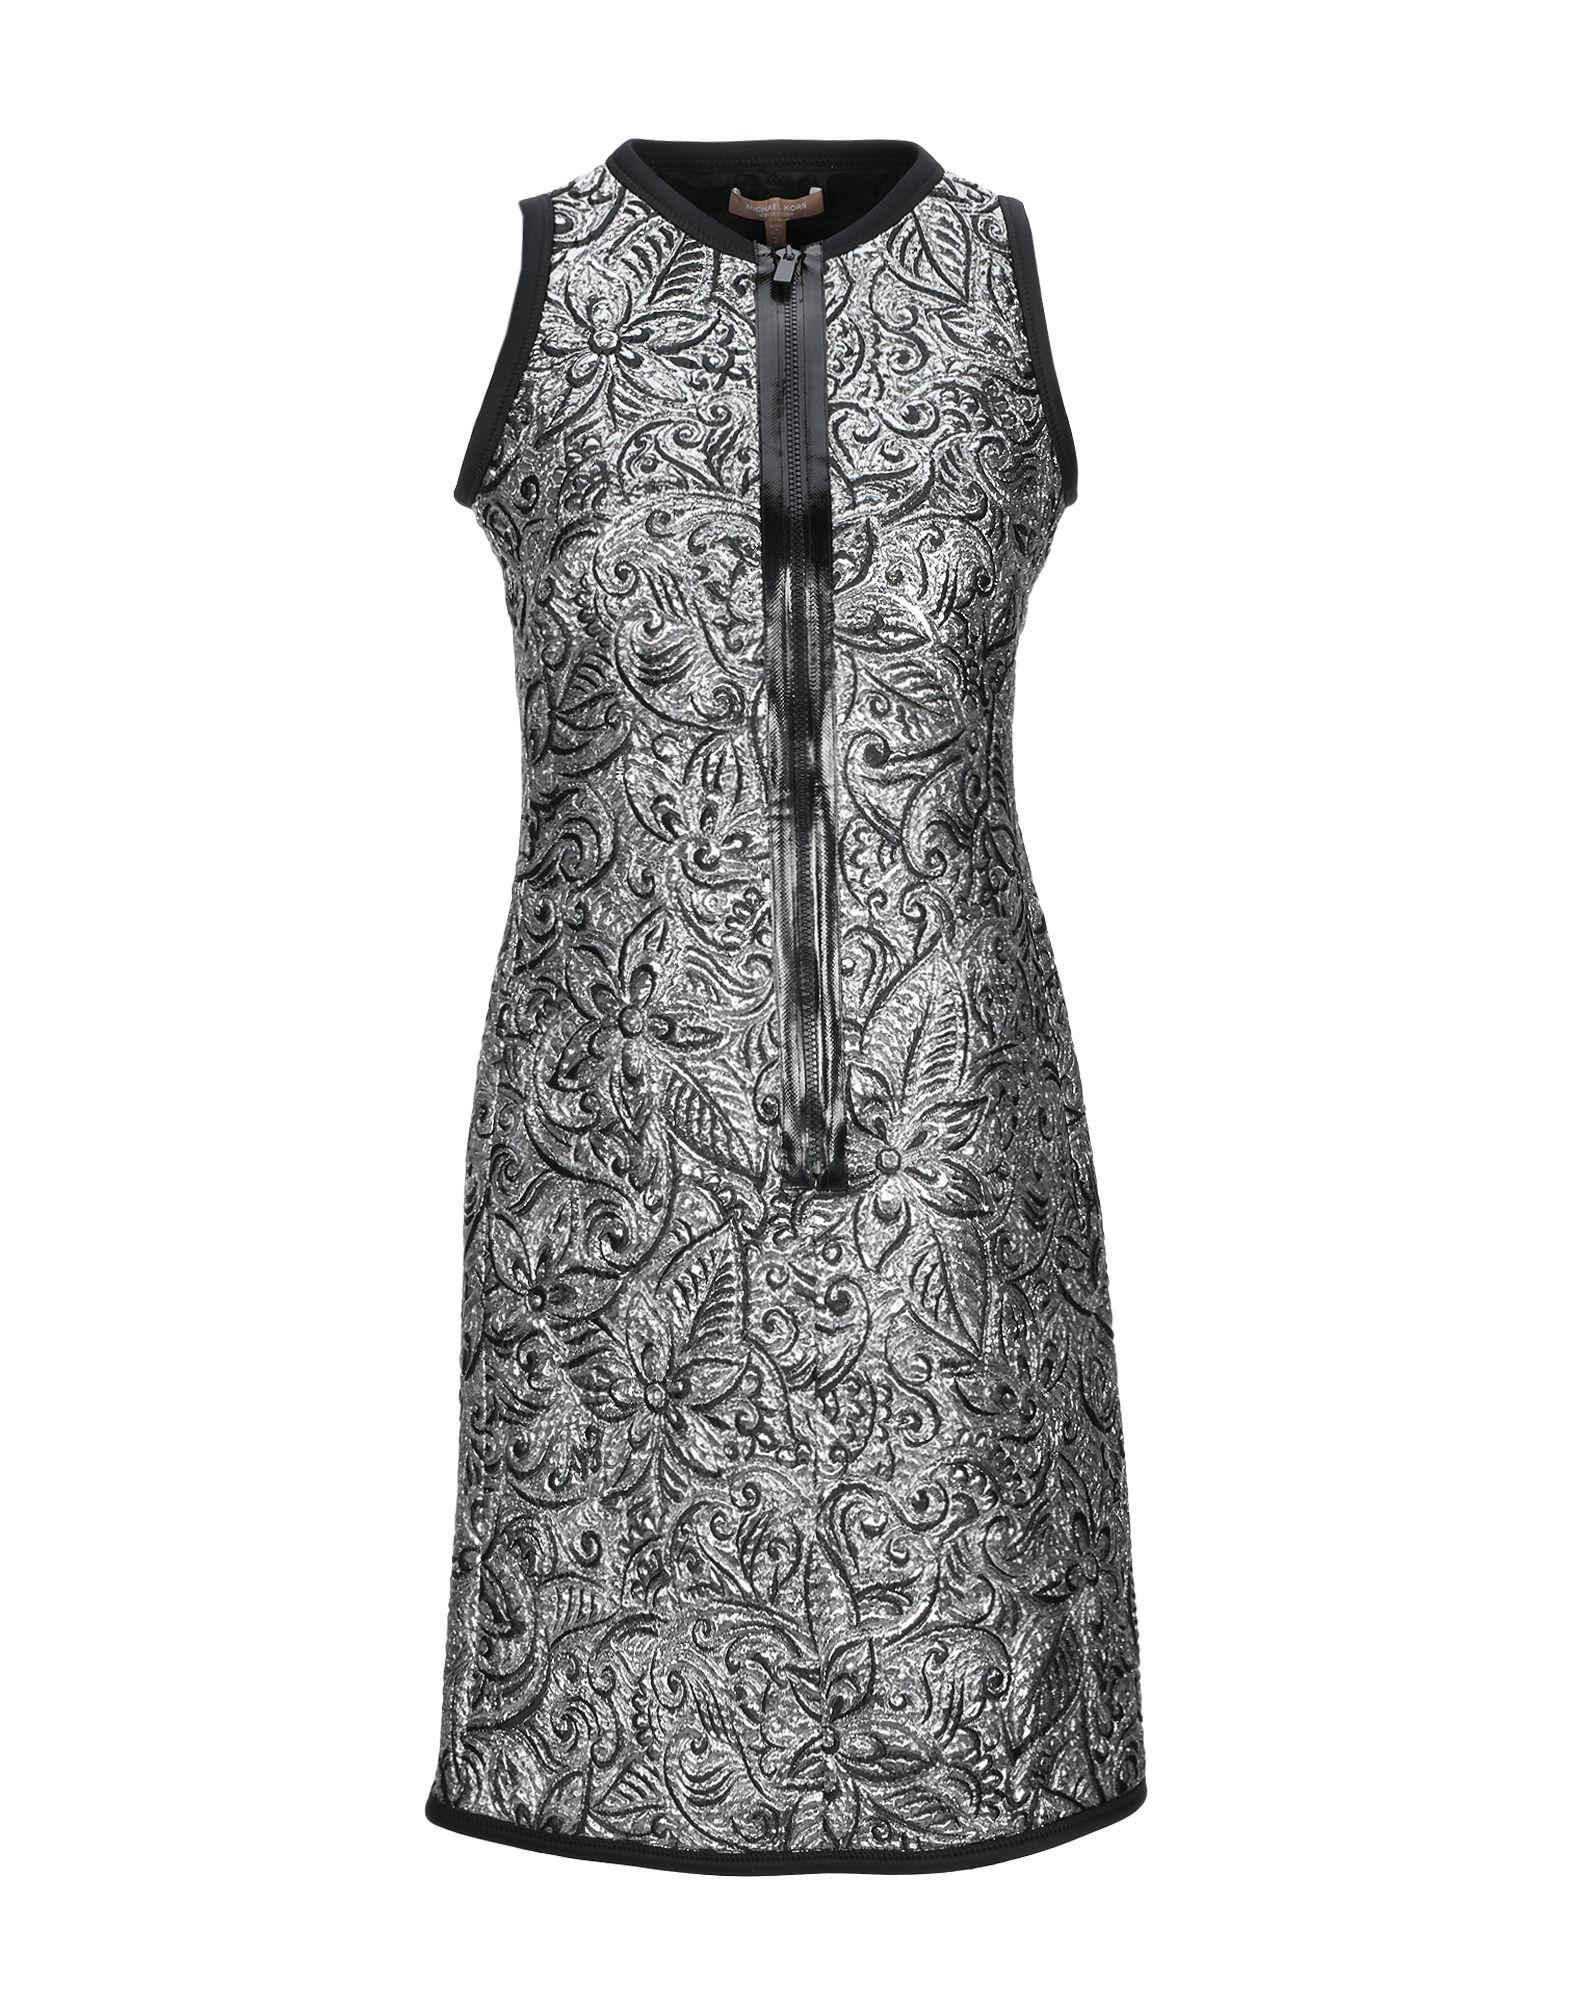 MICHAEL KORS COLLECTION Короткое платье